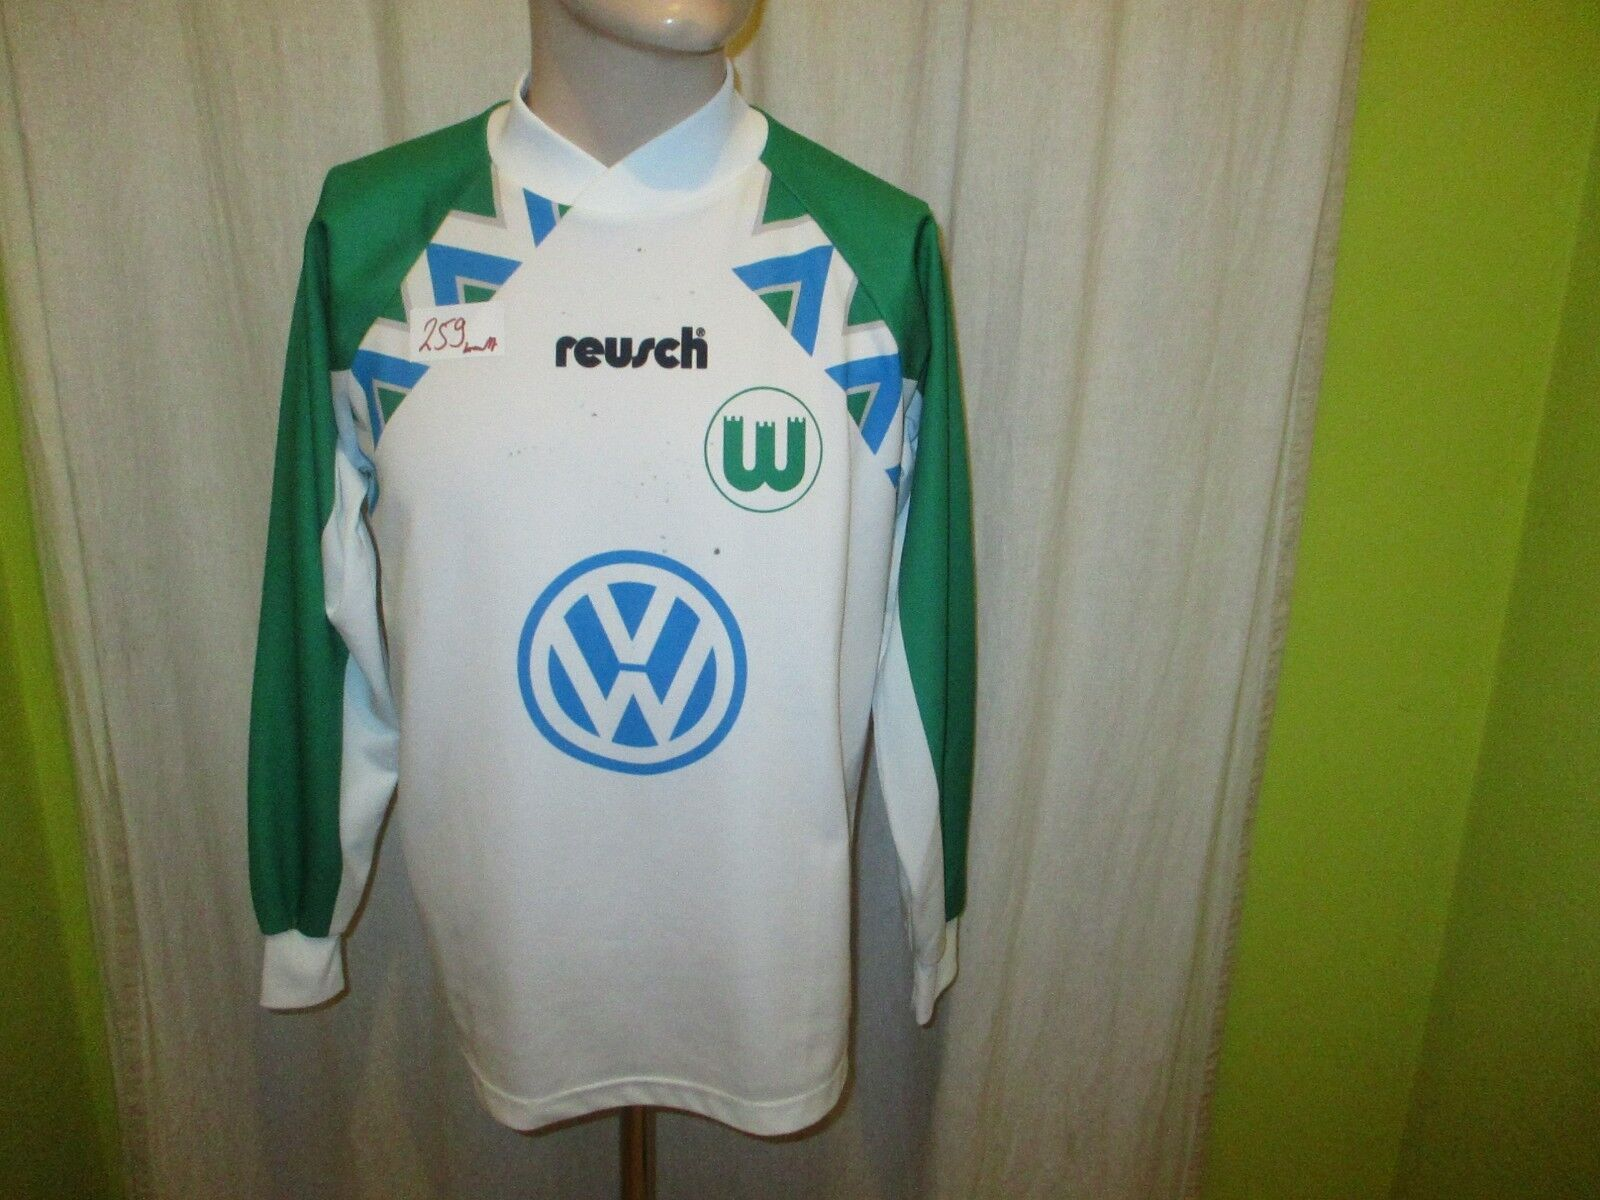 VfL Wolfsburg reusch Langarm Heim Trikot Trikot Trikot 1994 95  VW  + Signiert Gr.S- M  | Niedrige Kosten  5332c7